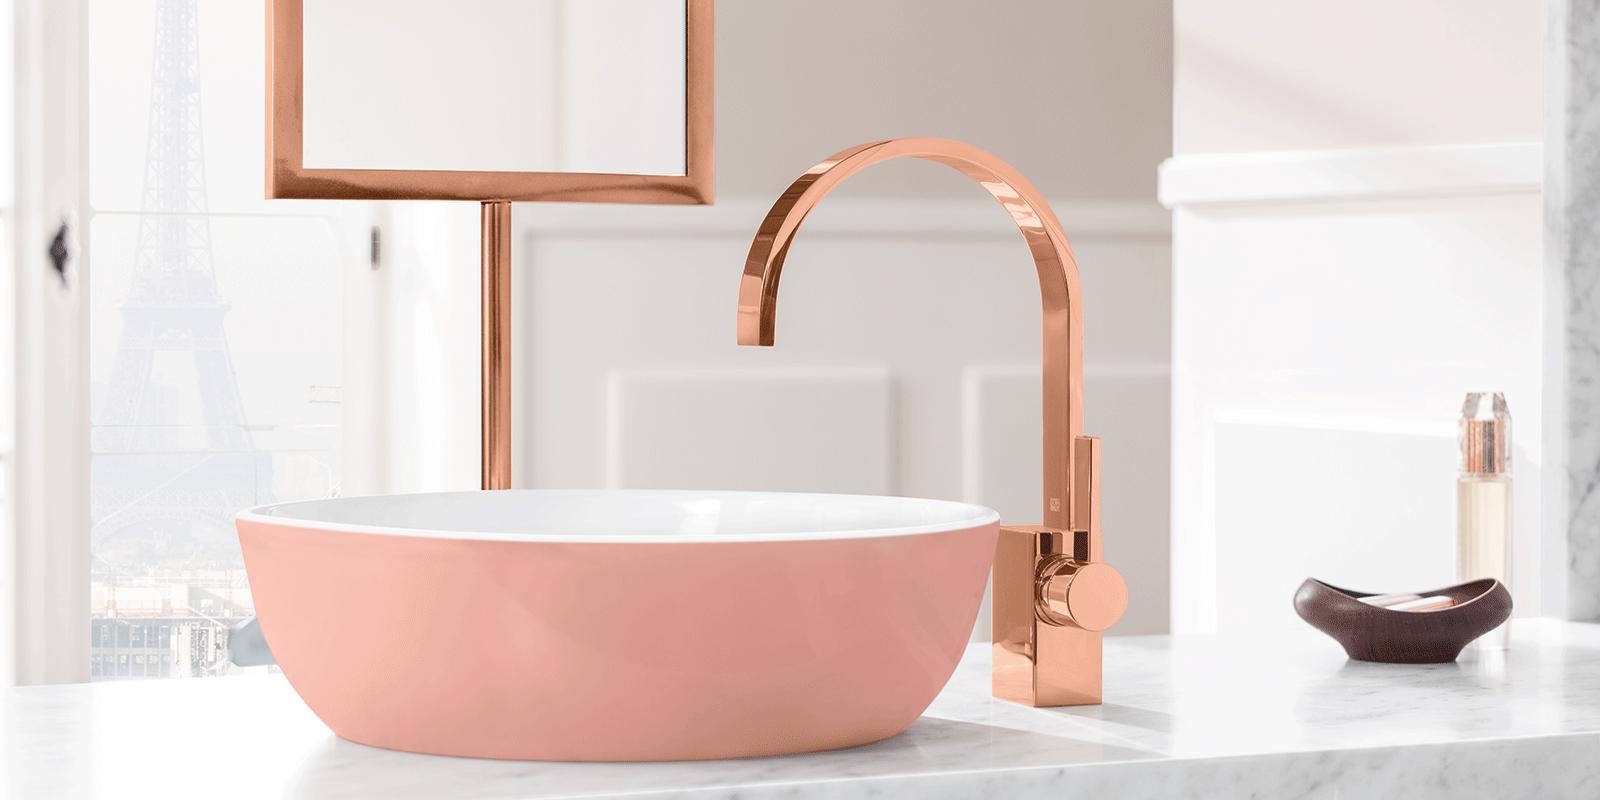 Badkamer, Design, Villeroy & Boch, wasbak, kleur